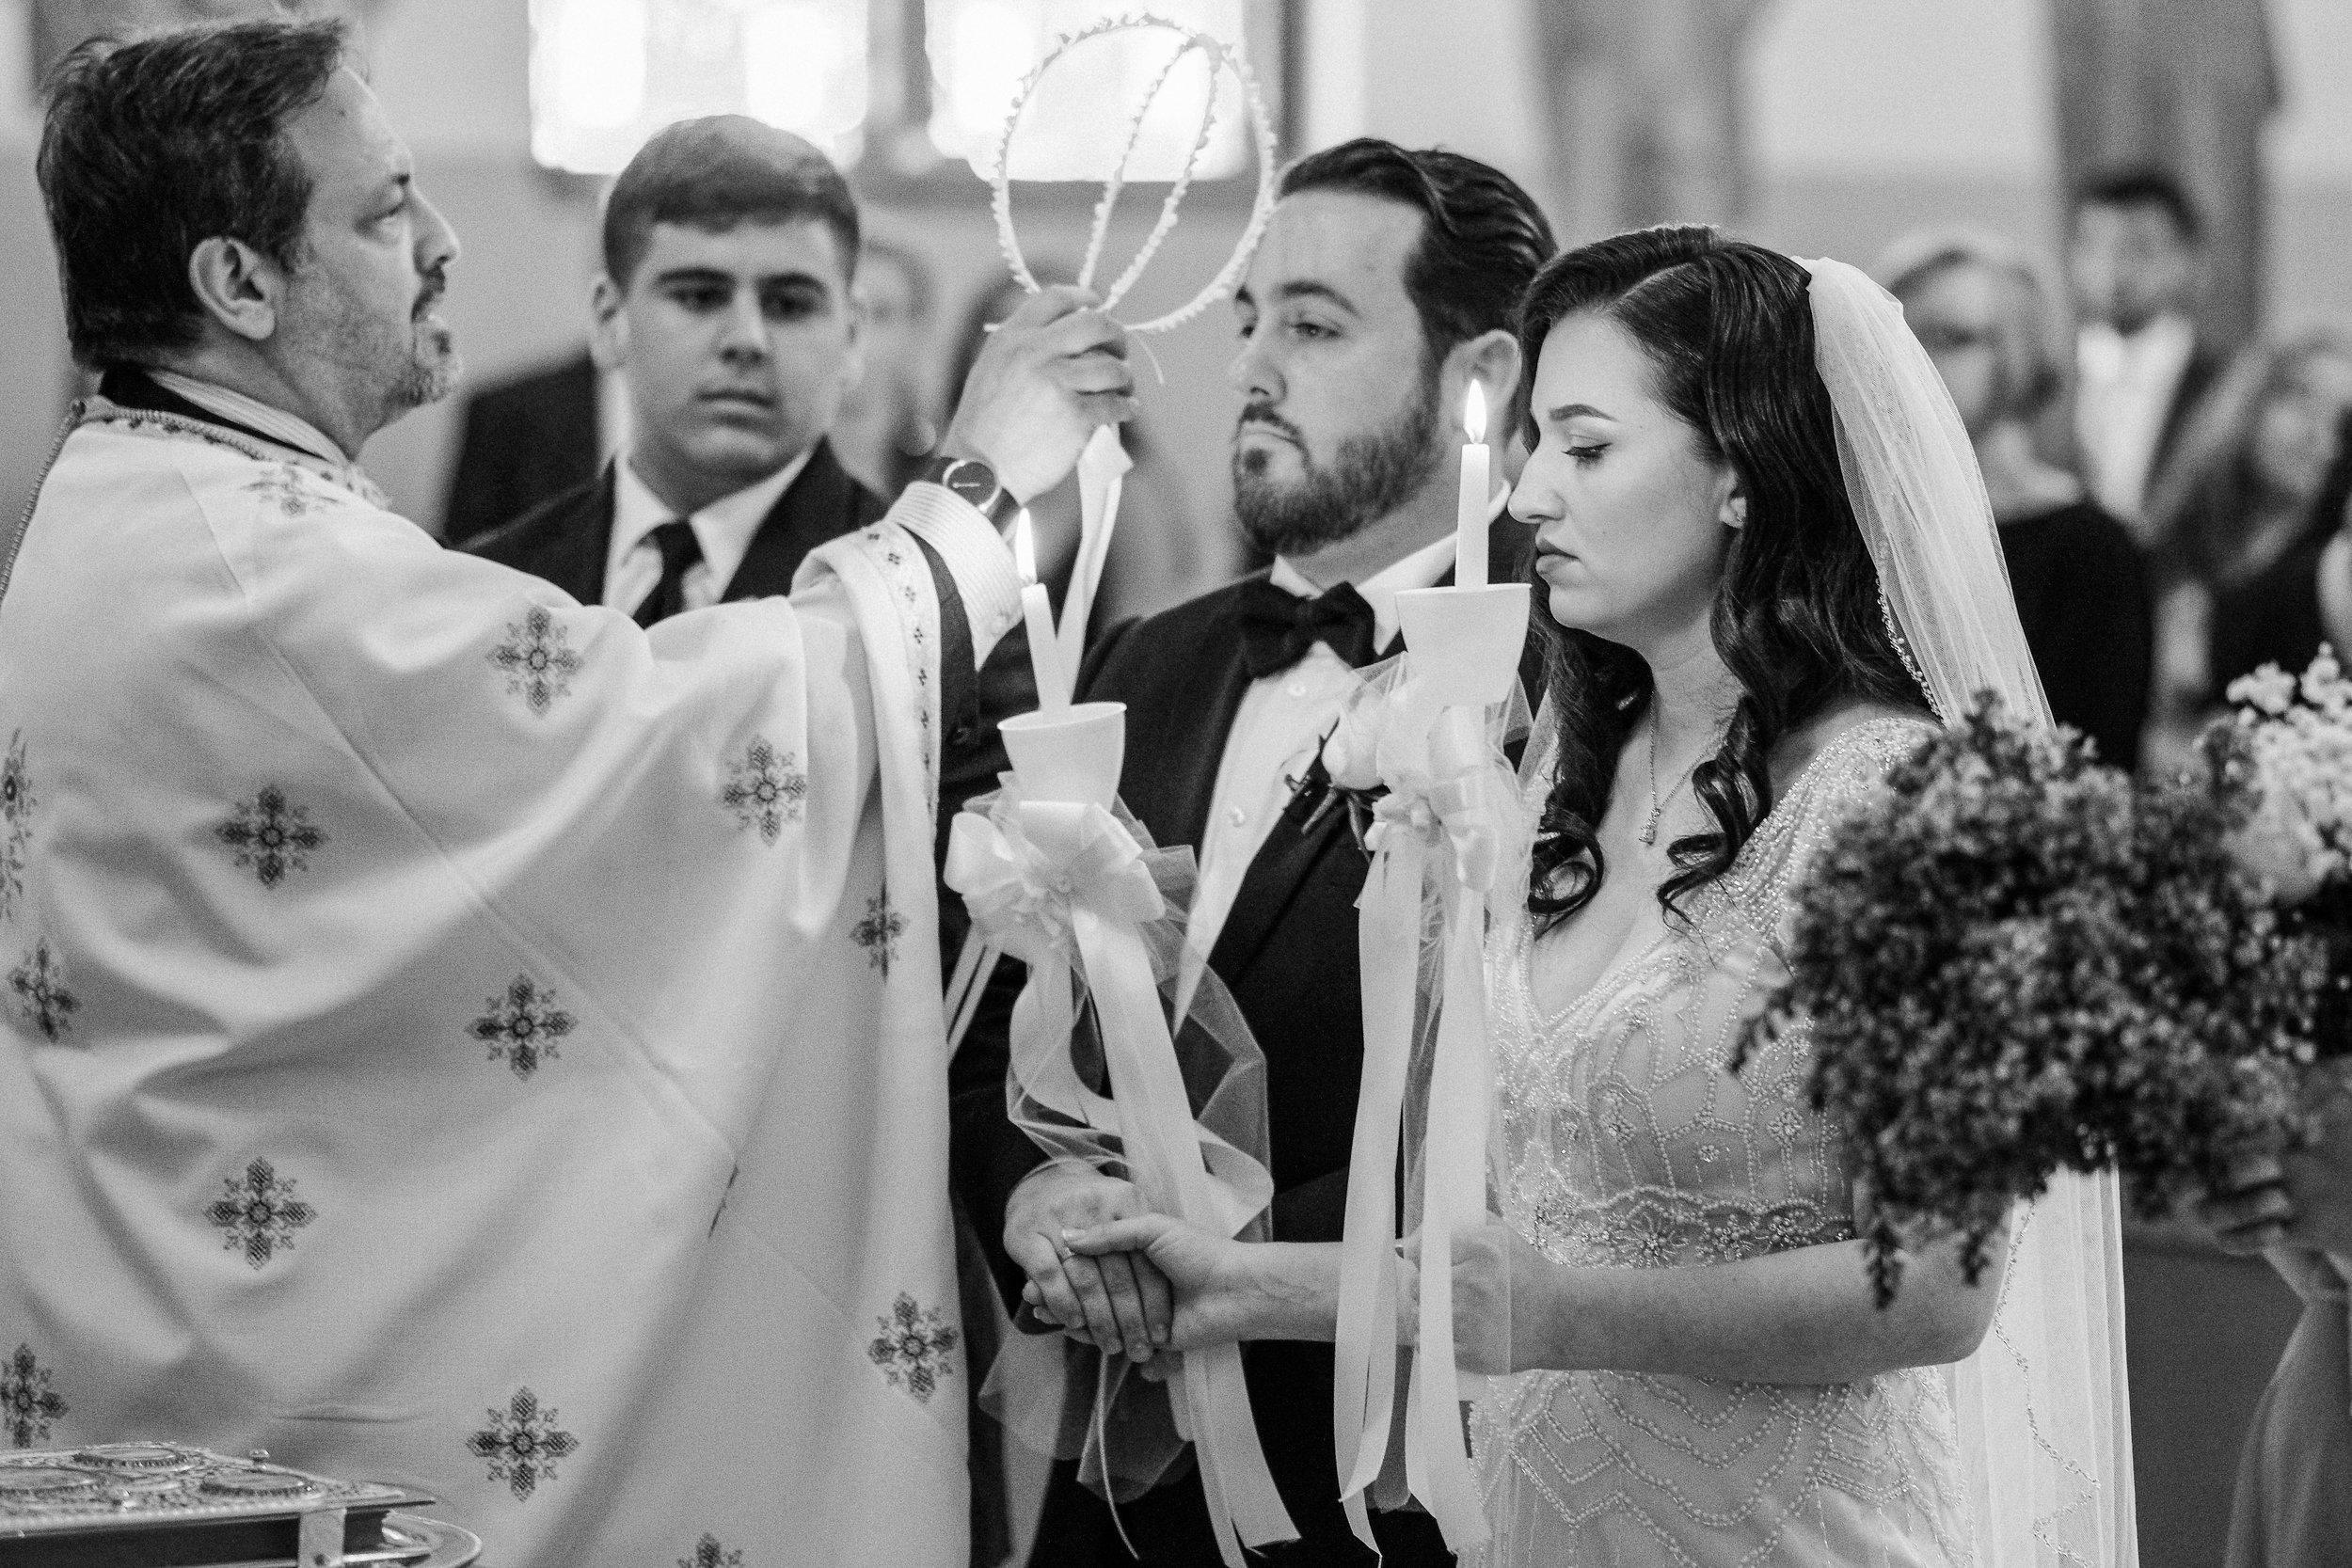 lyman-estate-wedding-photography-29.jpg